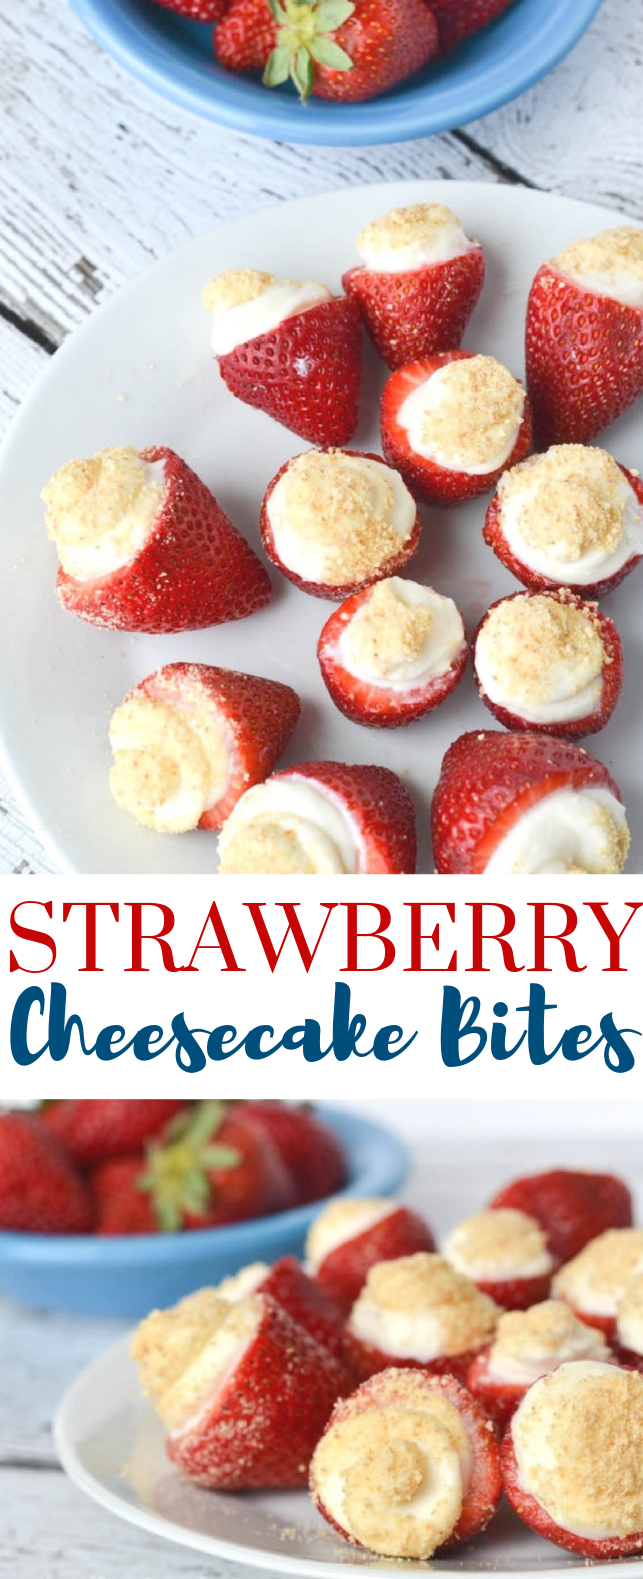 NO BAKE STRAWBERRY CHEESECAKE BITES #Dessertforparties #Sweets